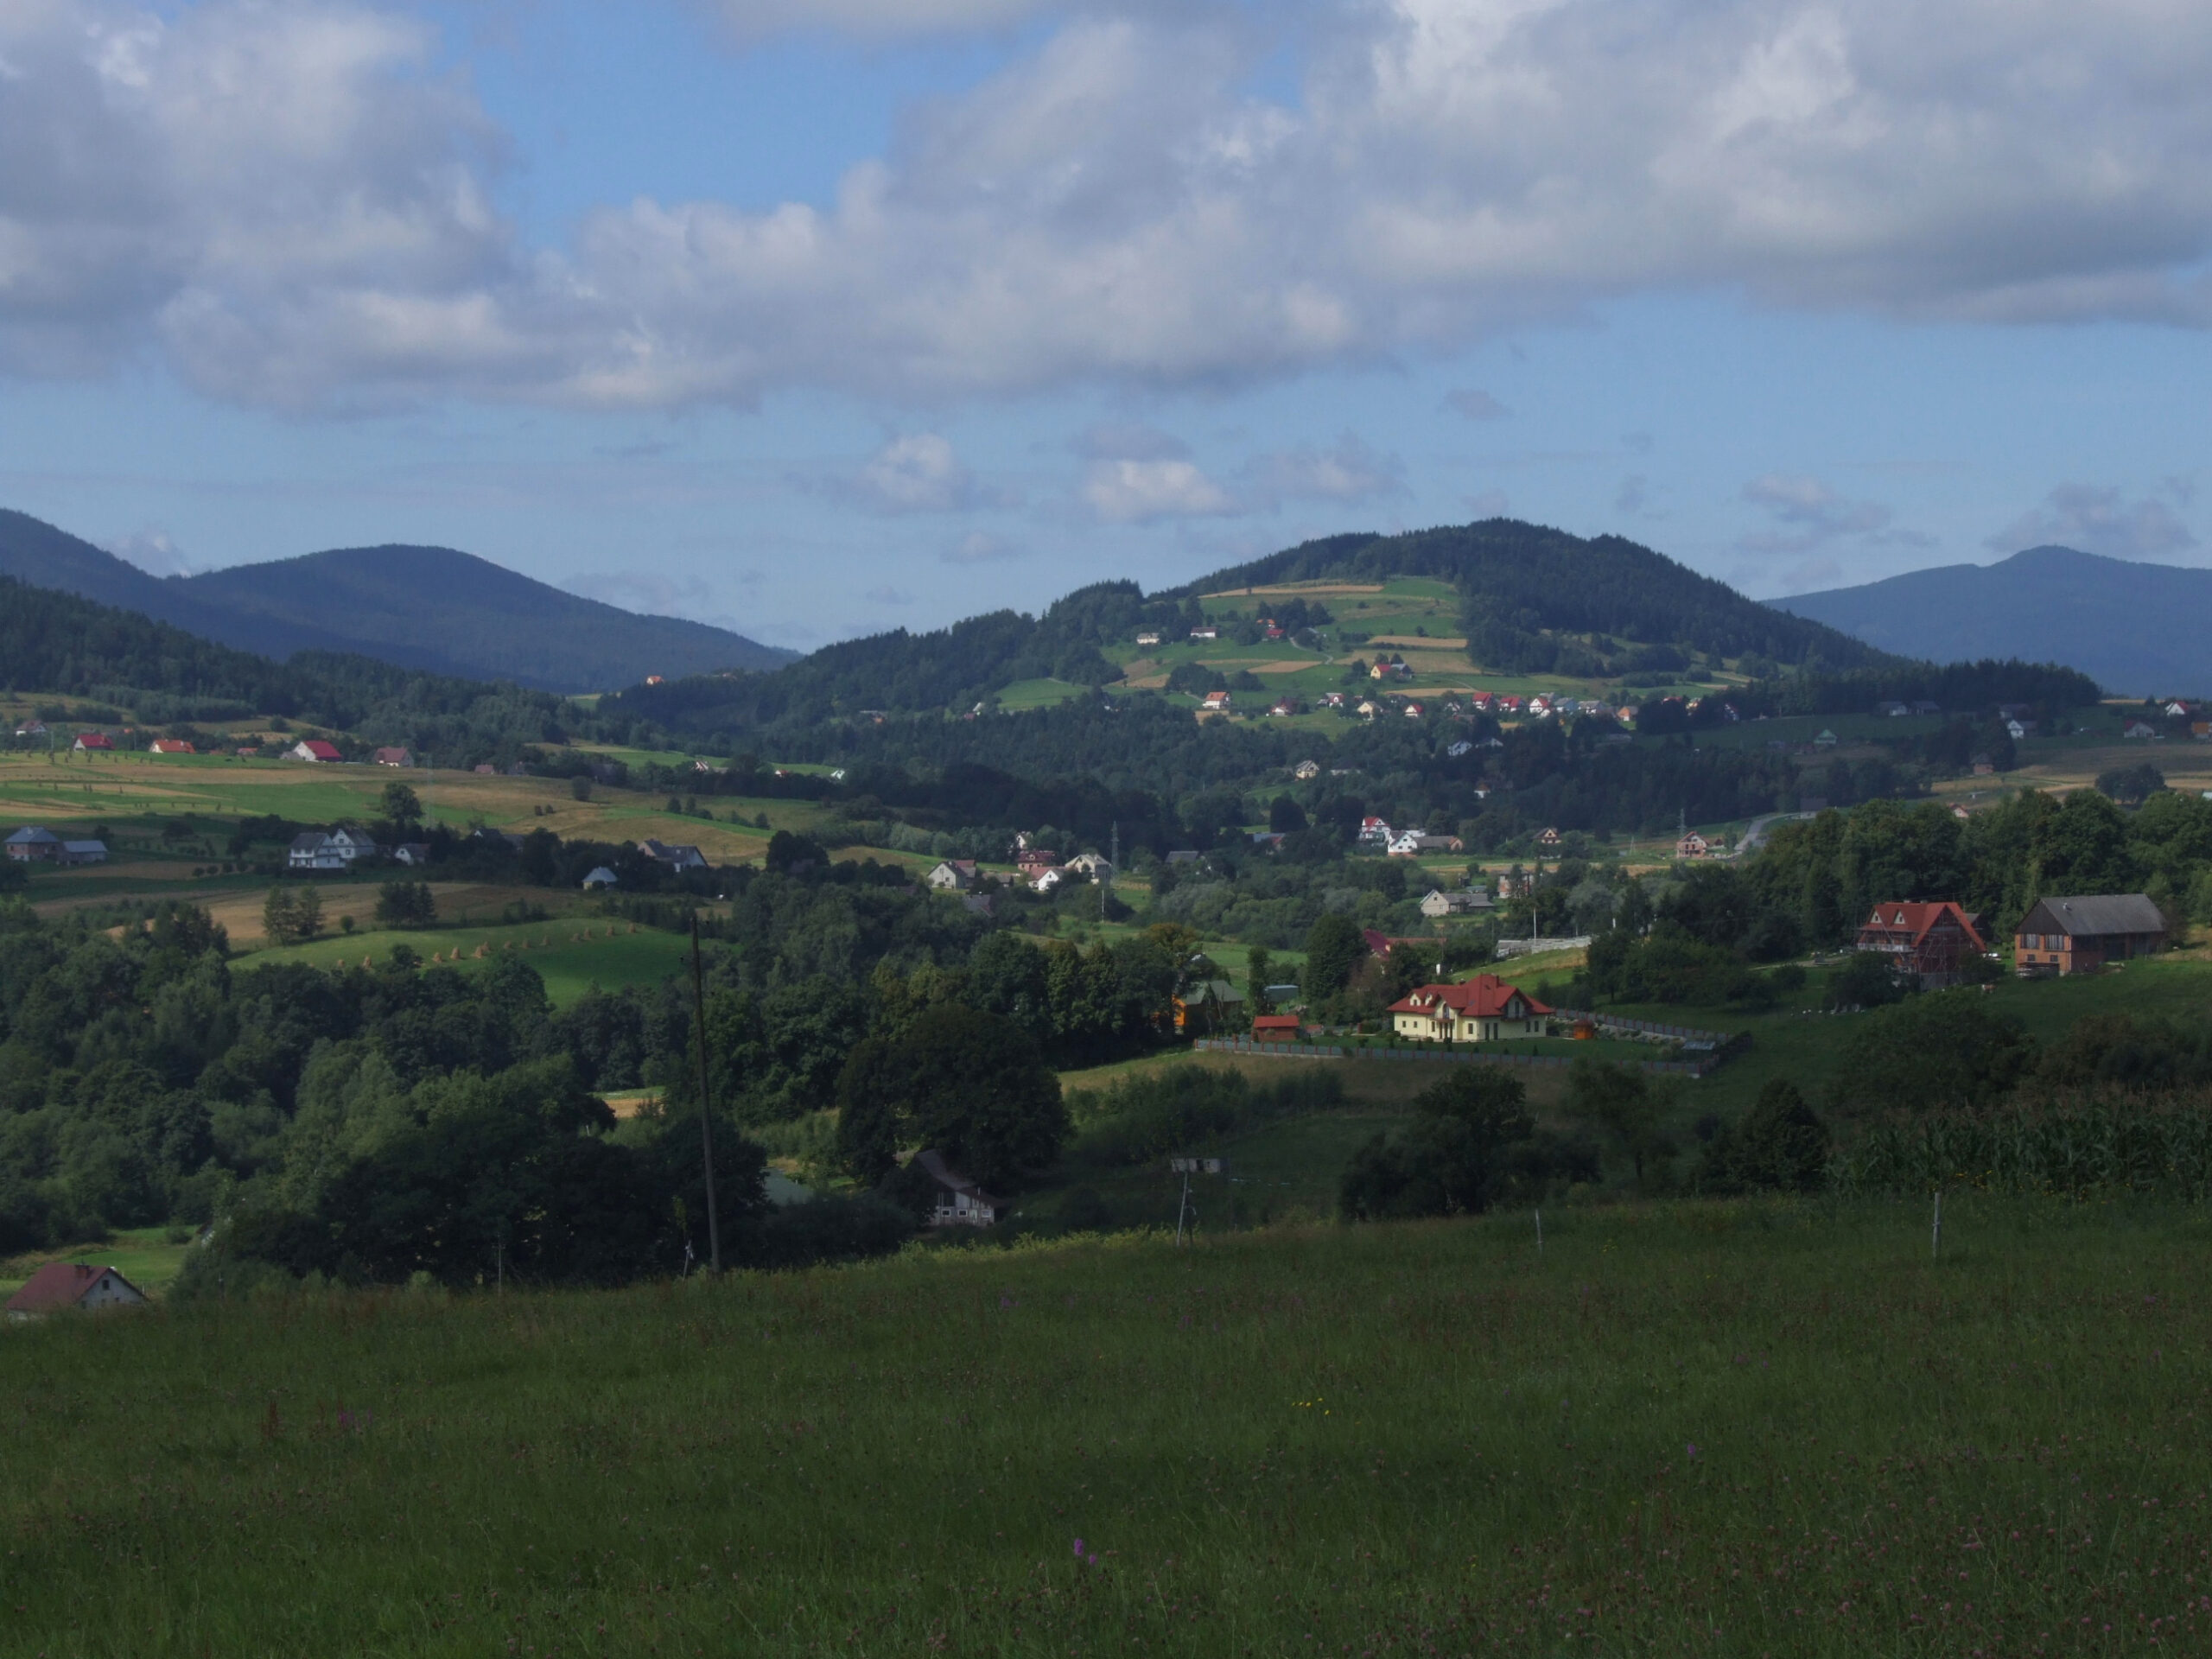 Wzgórze Golców (752 m n.p.m.)